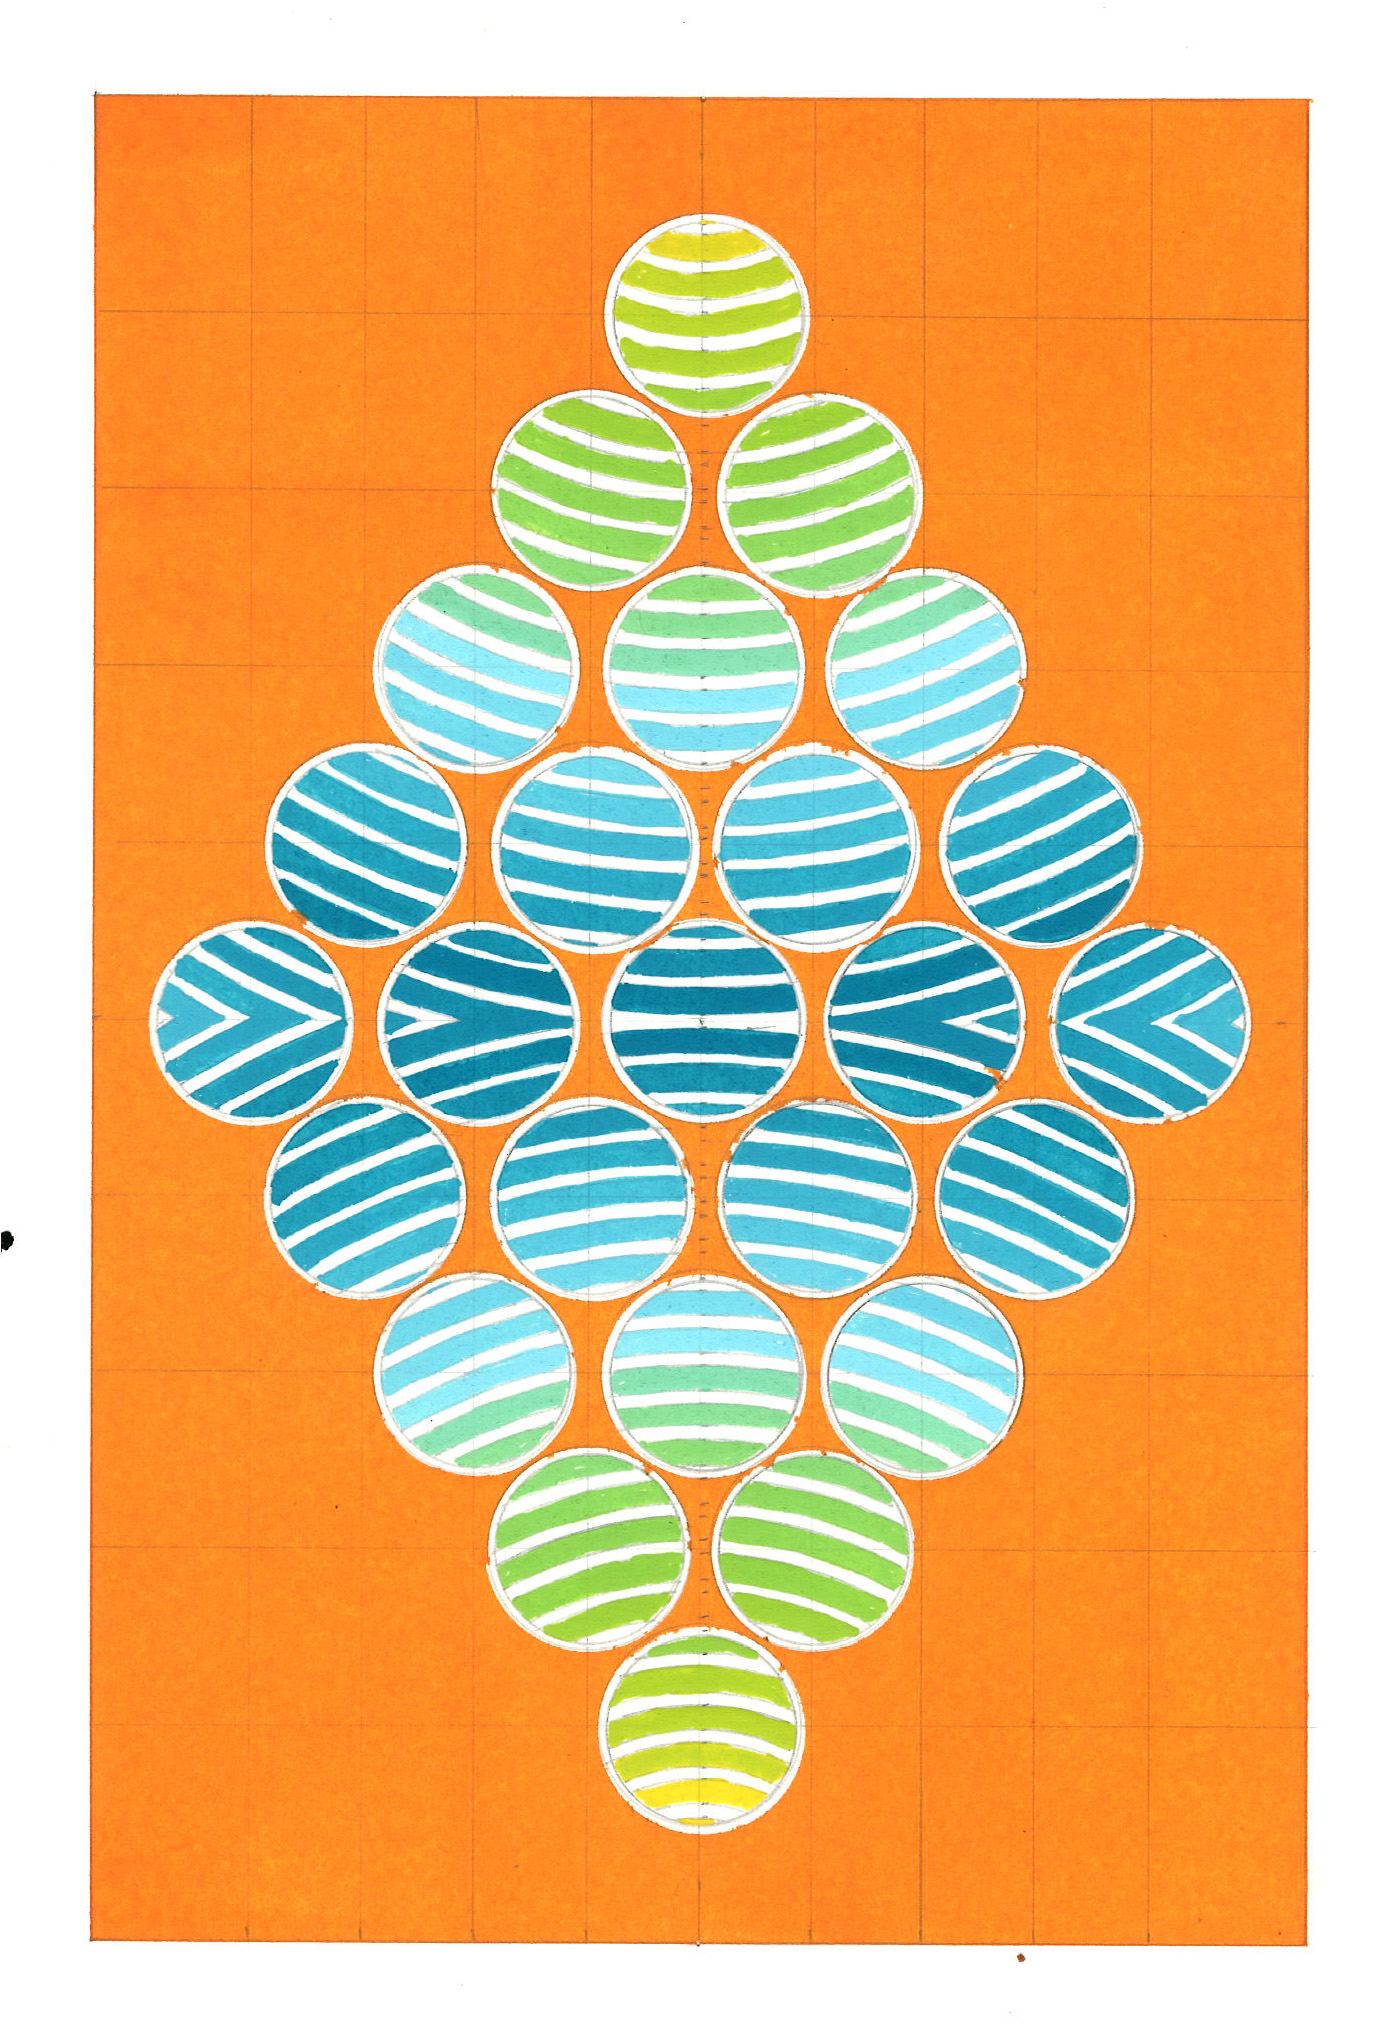 kmcontemporary David Rufo Diamond Dot Orange  wc 10x7 $50o